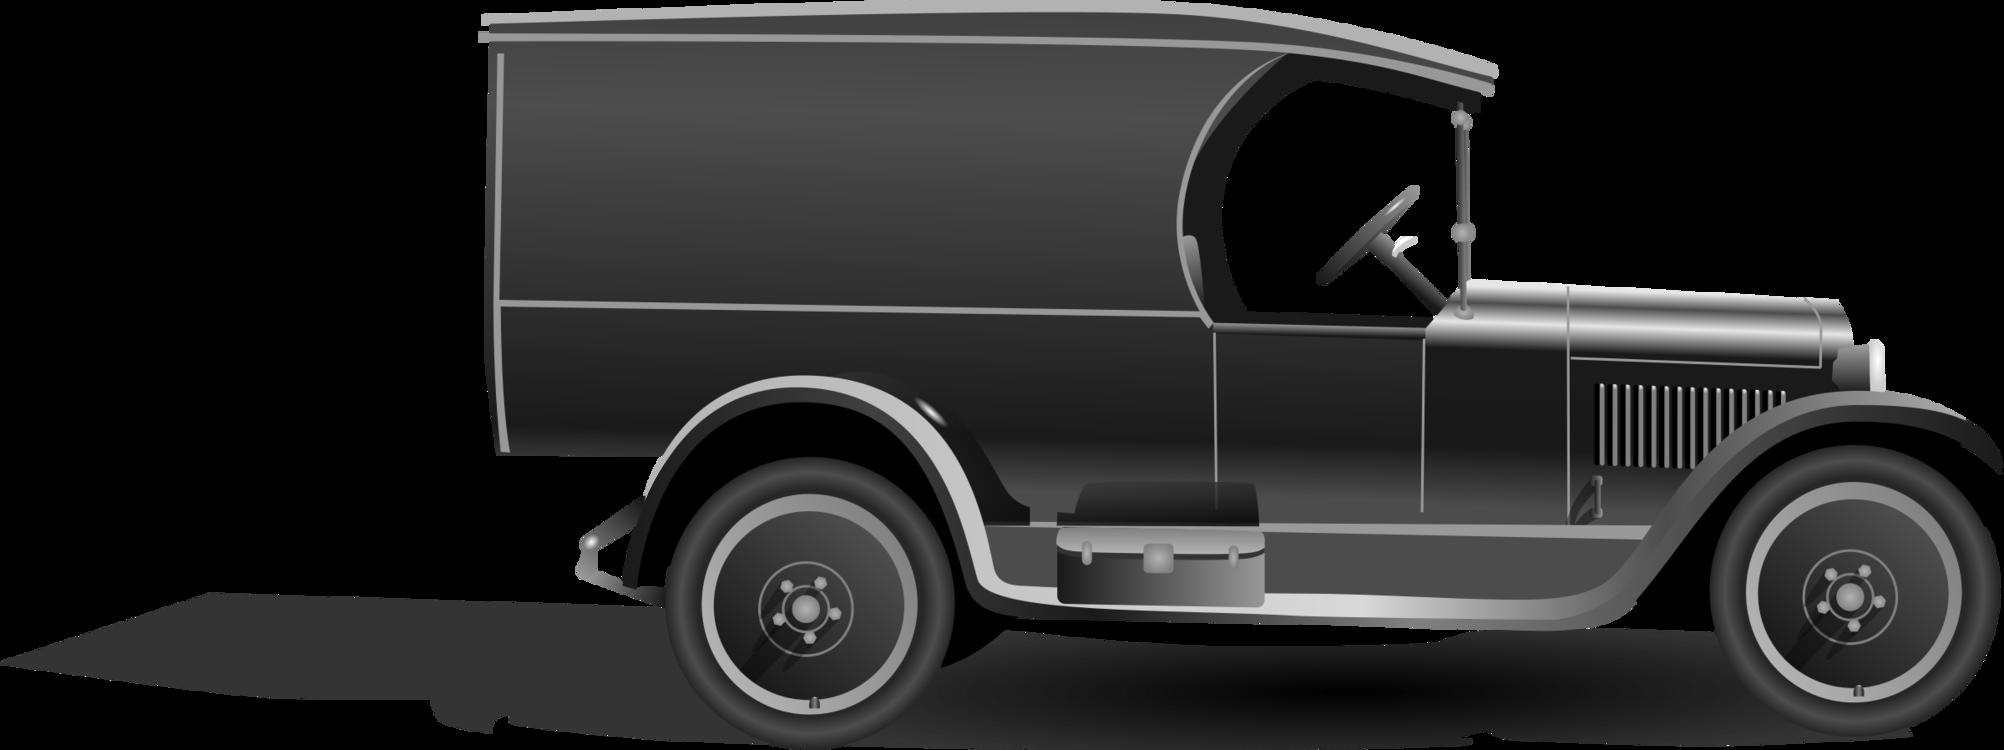 Wheel,Classic Car,Van